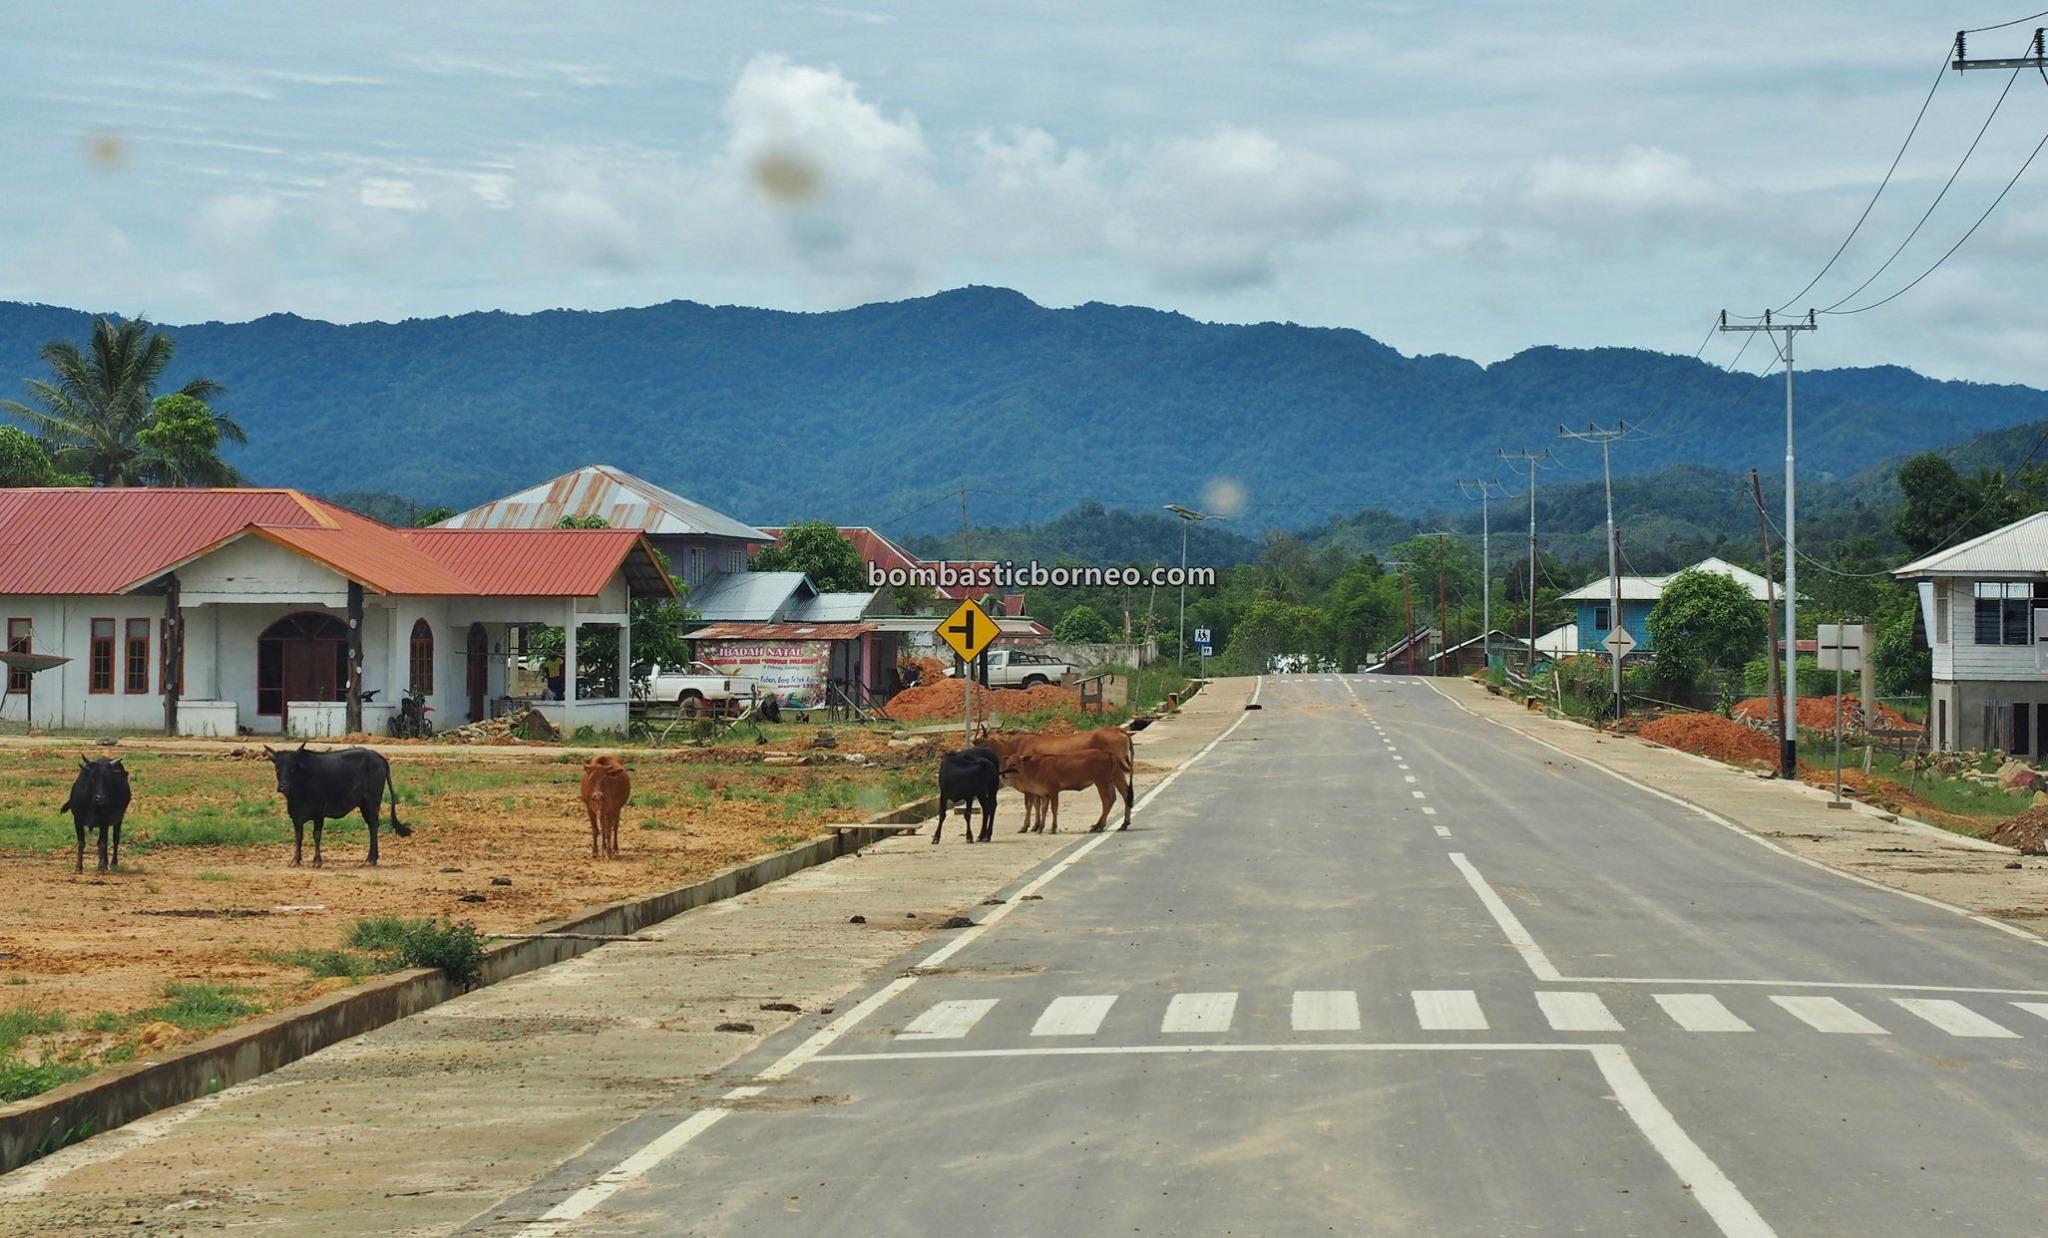 Indonesia, North Kalimantan, Nunukan, Krayan, Long Nawang, adventure, exploration, Highlands, native, Suku Dayak Lundayeh, Tourism, tourist attraction, travel guide, Cross Border, Borneo